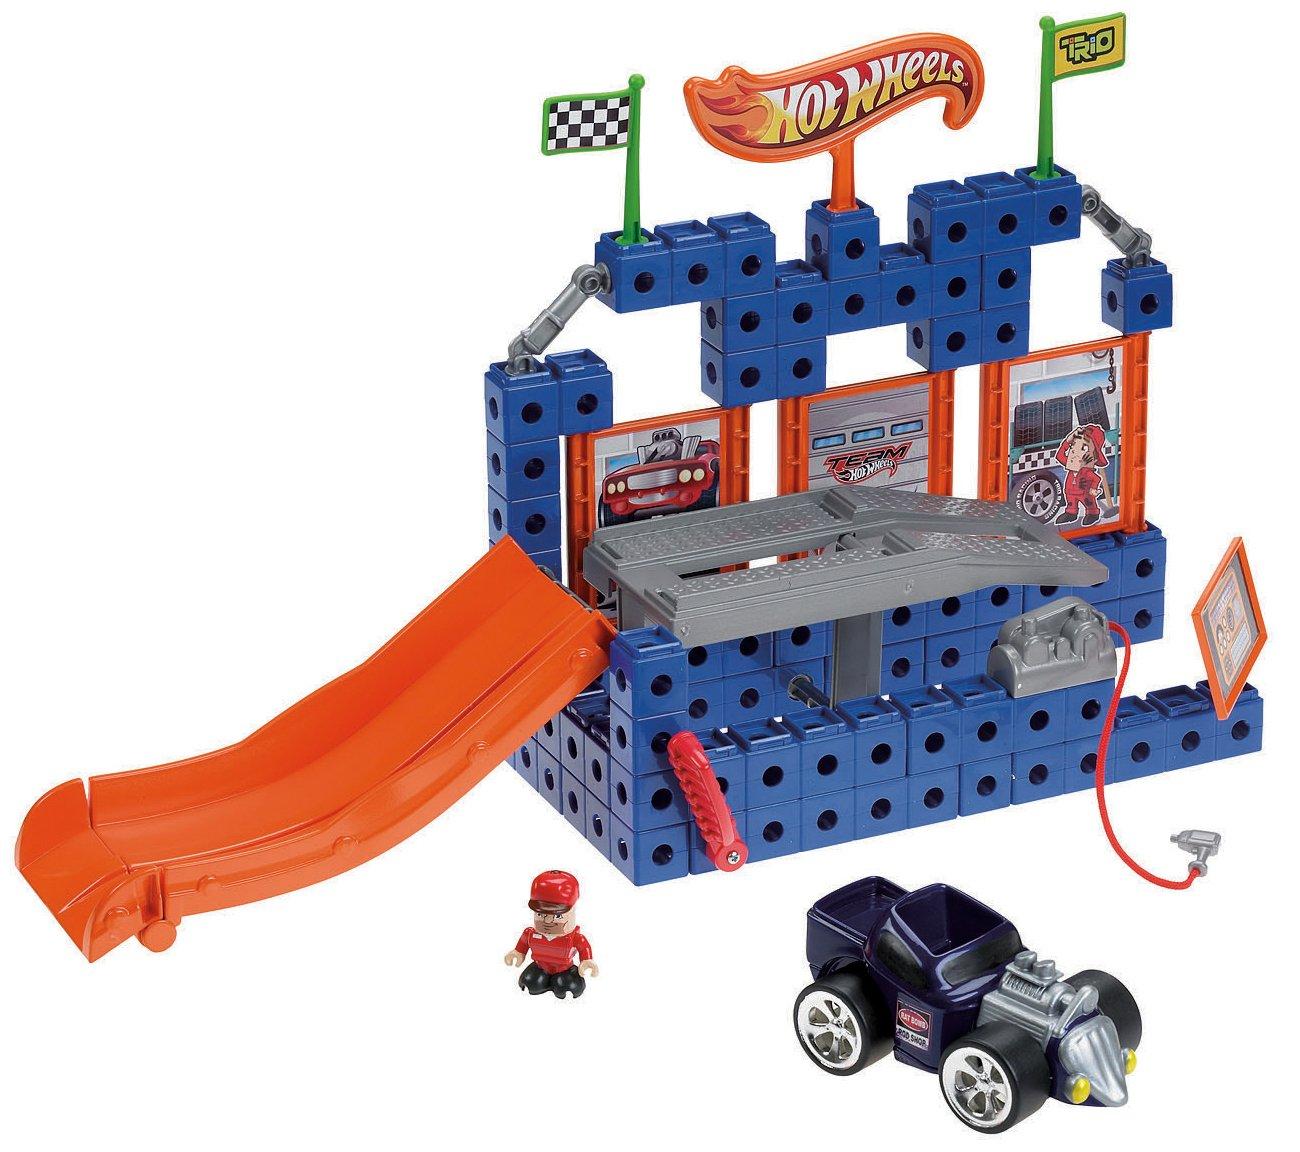 fisherprice trio hot wheels lift 'n go garage amazonca automotive -